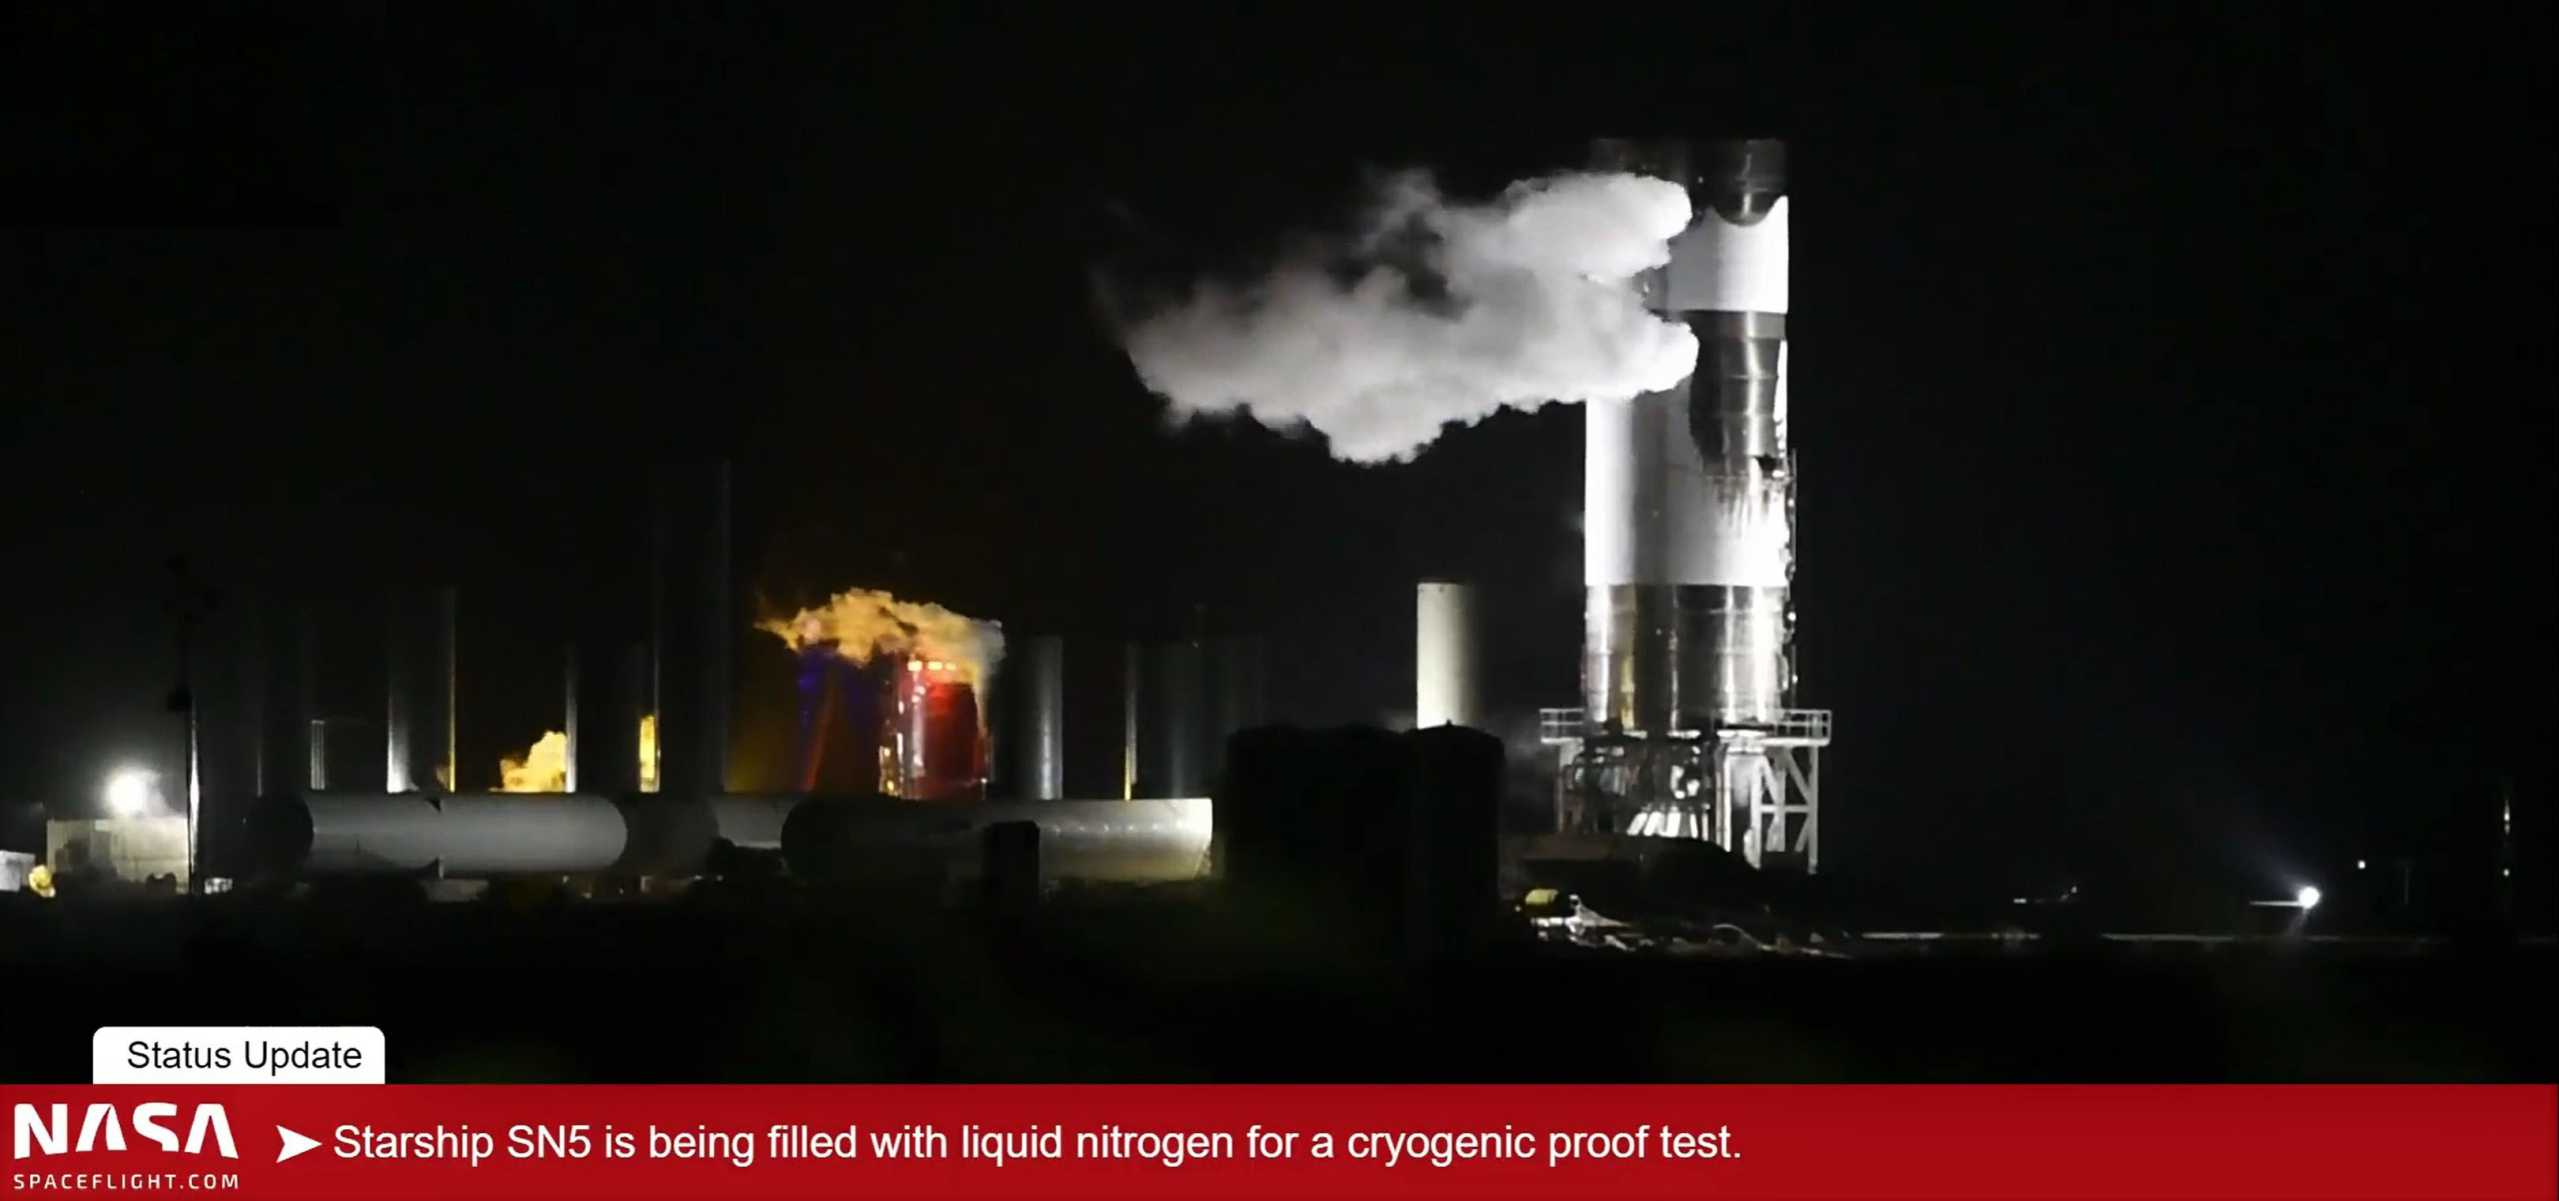 Starship Boca Chica 063020 (NASASpaceflight – bocachicagal) SN5 cryo press test 3 (c)